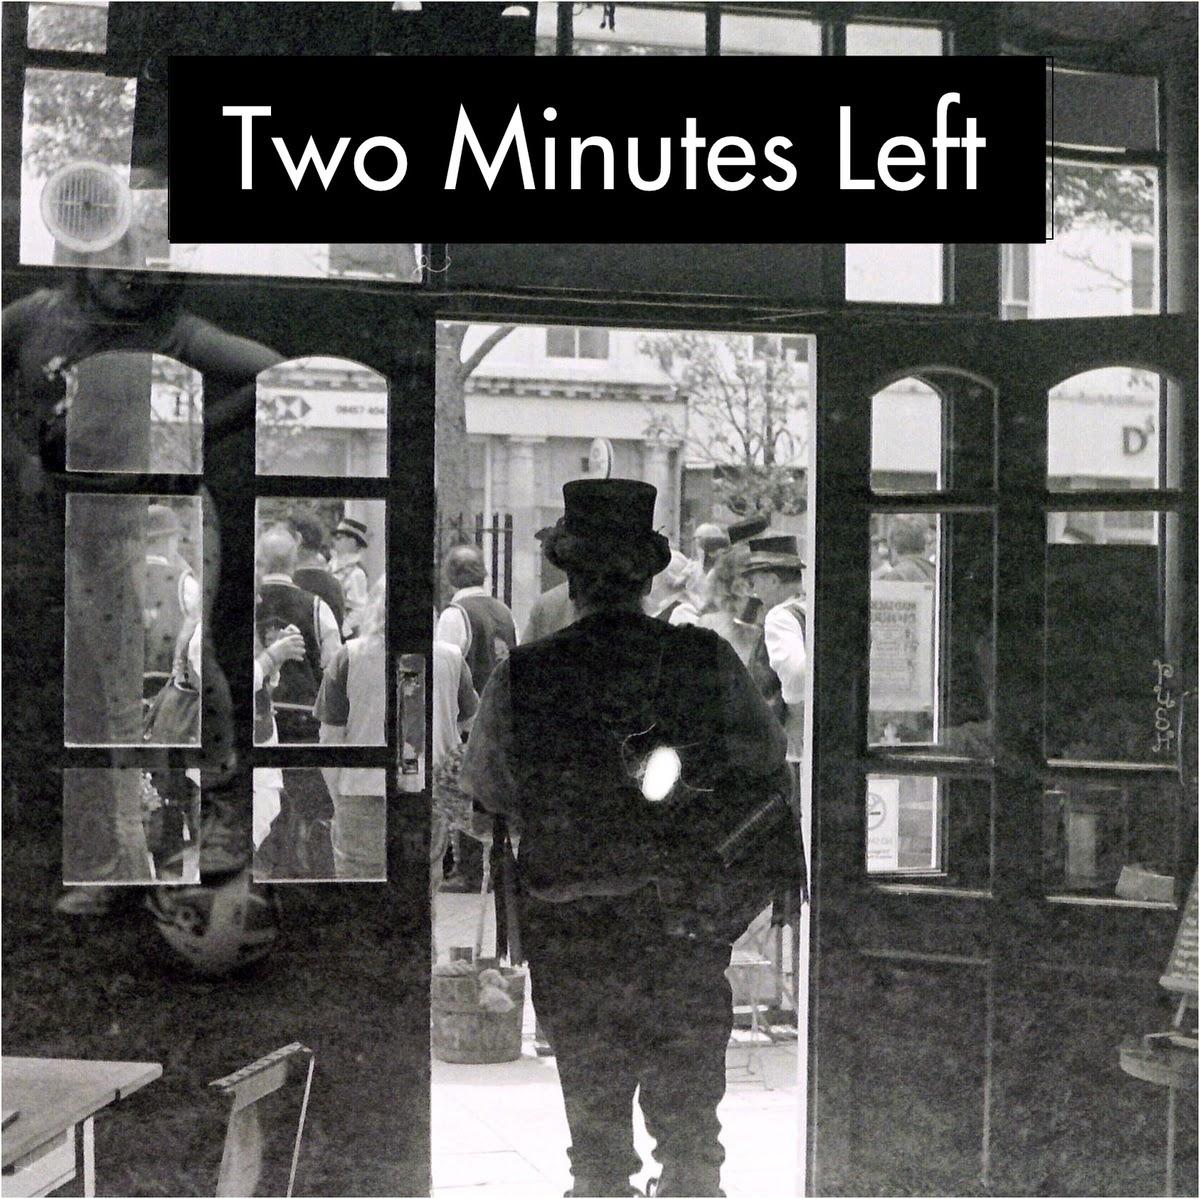 Transpontine: Two Minutes Left